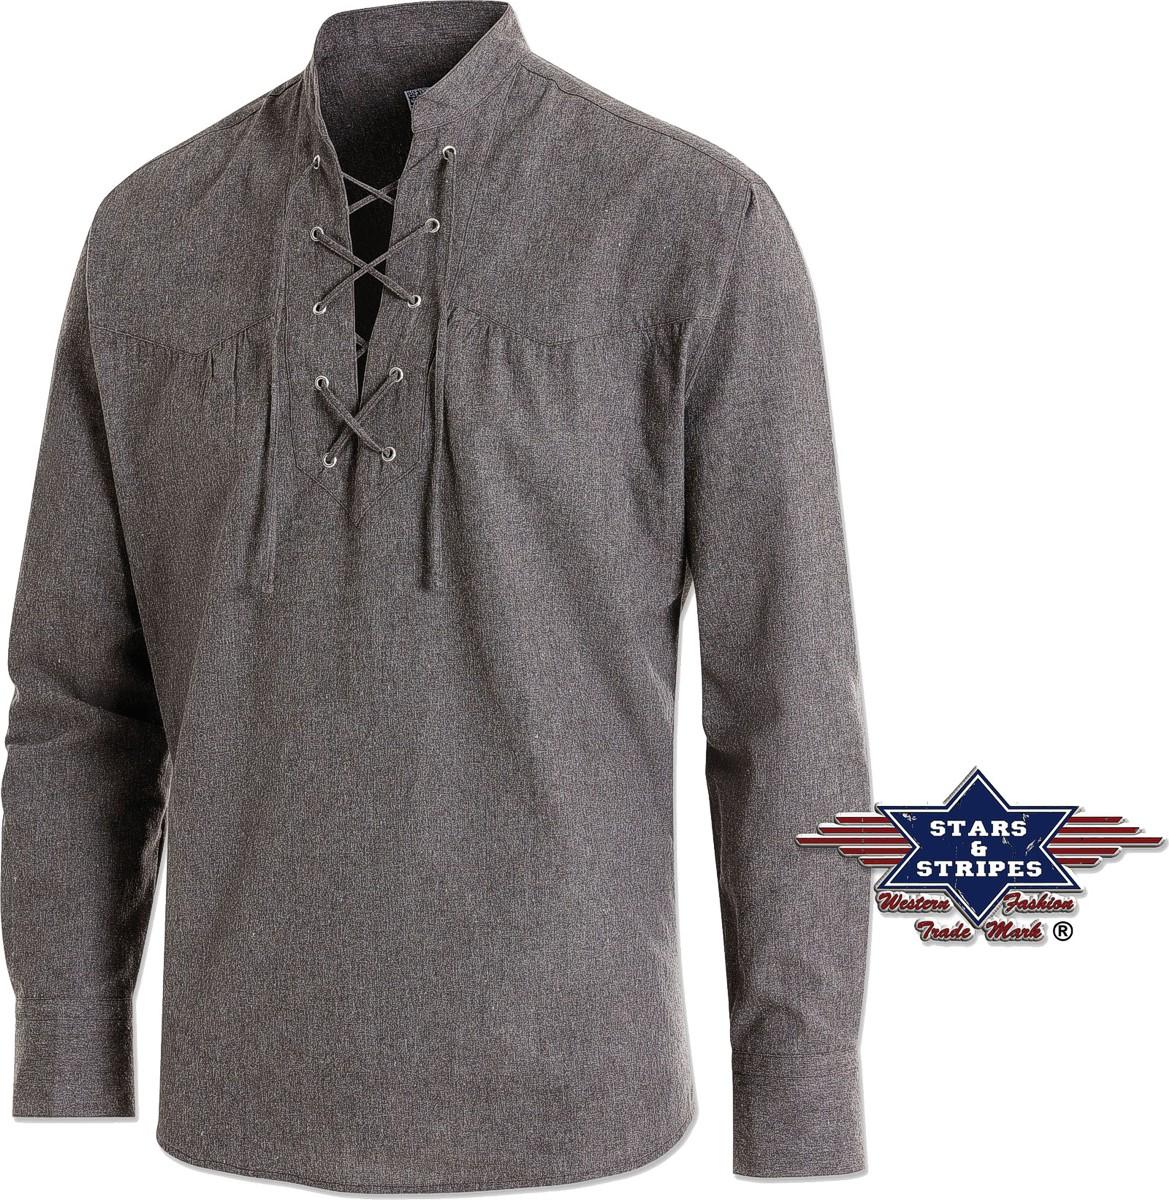 Stars & Stripes Herren Westernhemd »COLUMBUS« Oldstyle Grey Grau